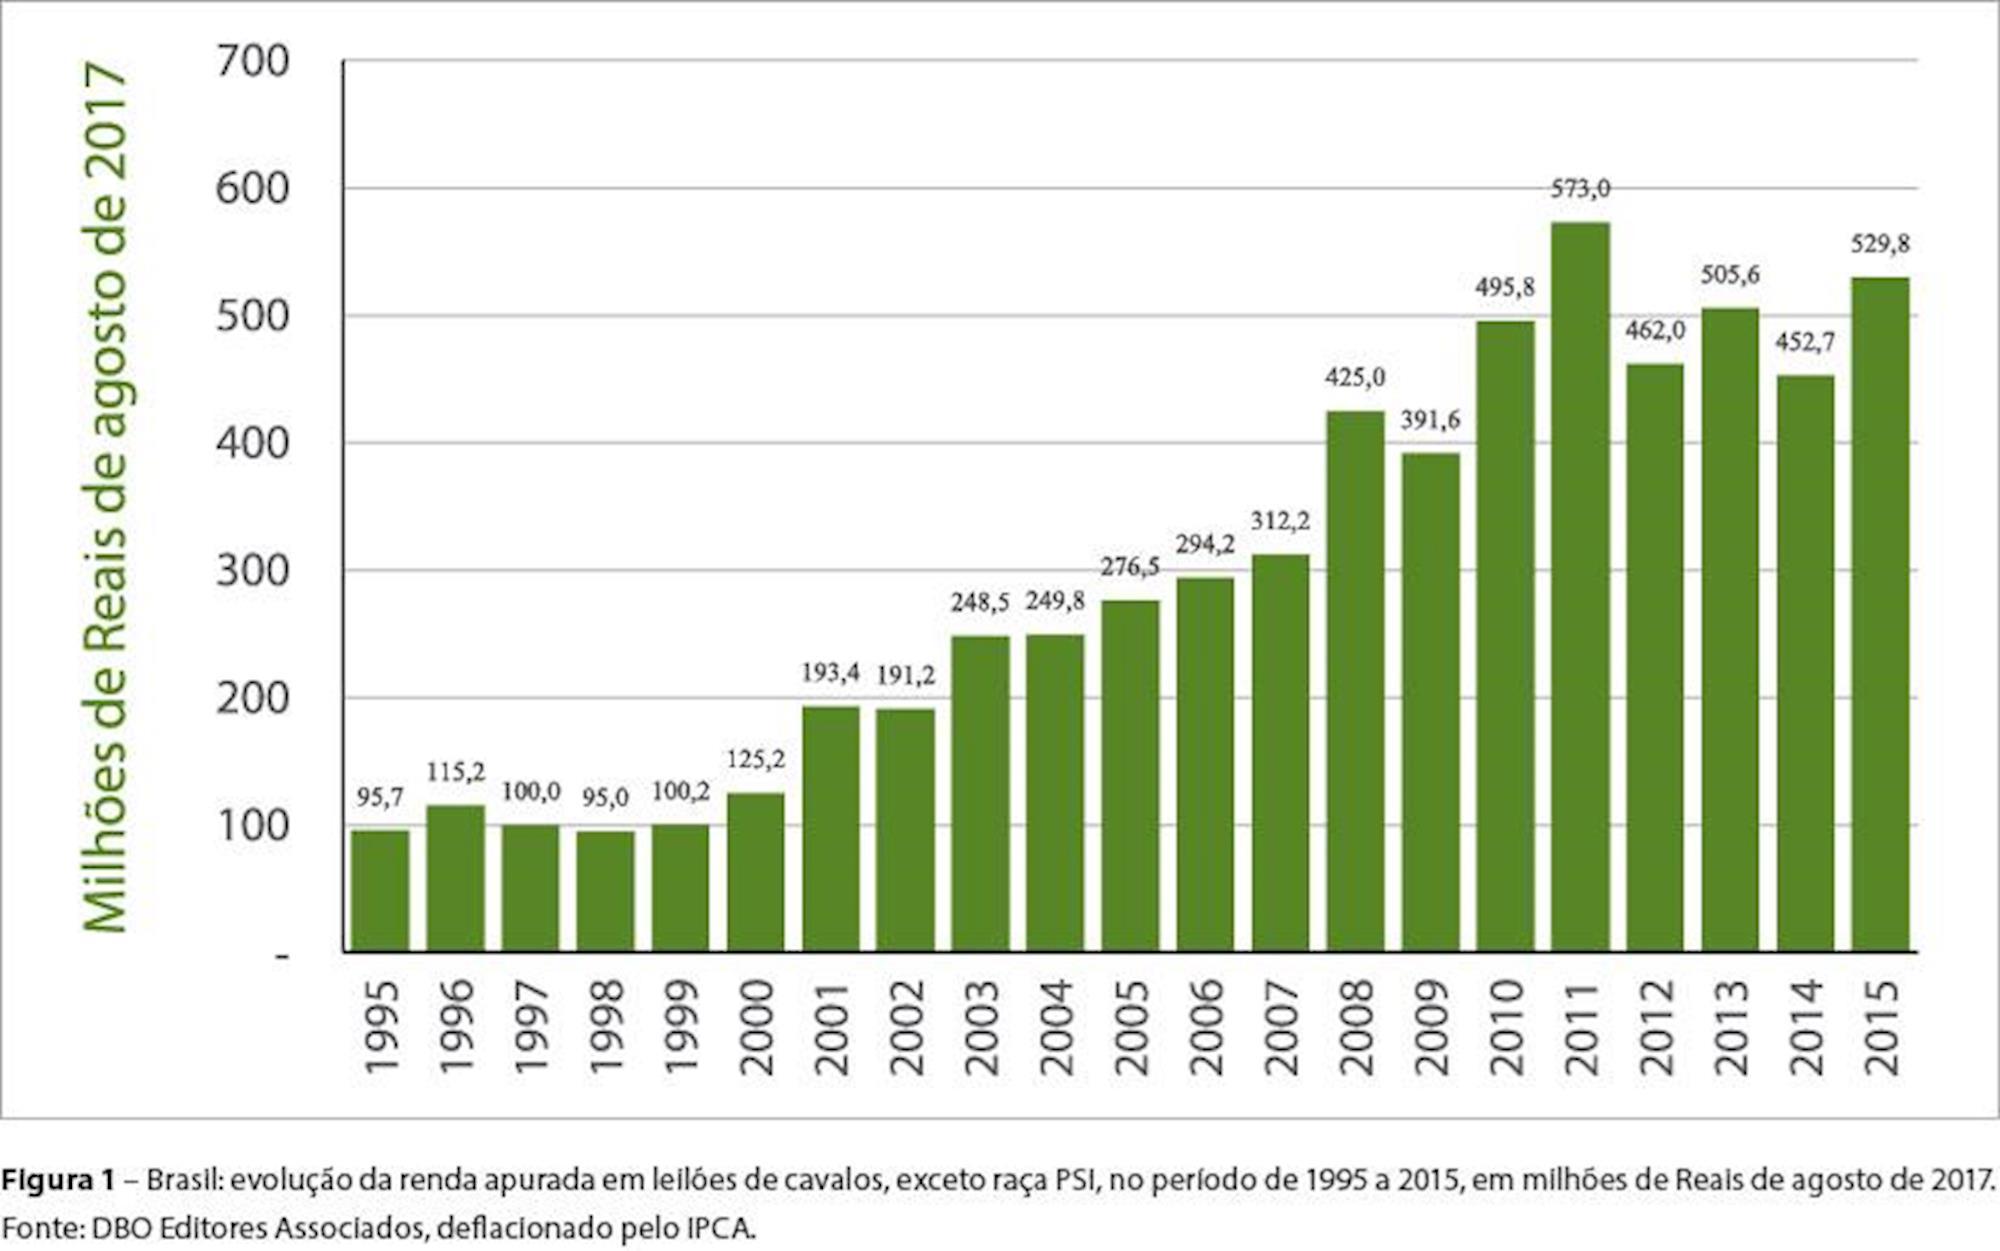 equinocultura, Mercado de cavalos, agronegócio, Fonte: DBO Editores Associados, deflacionado pelo IPCA.